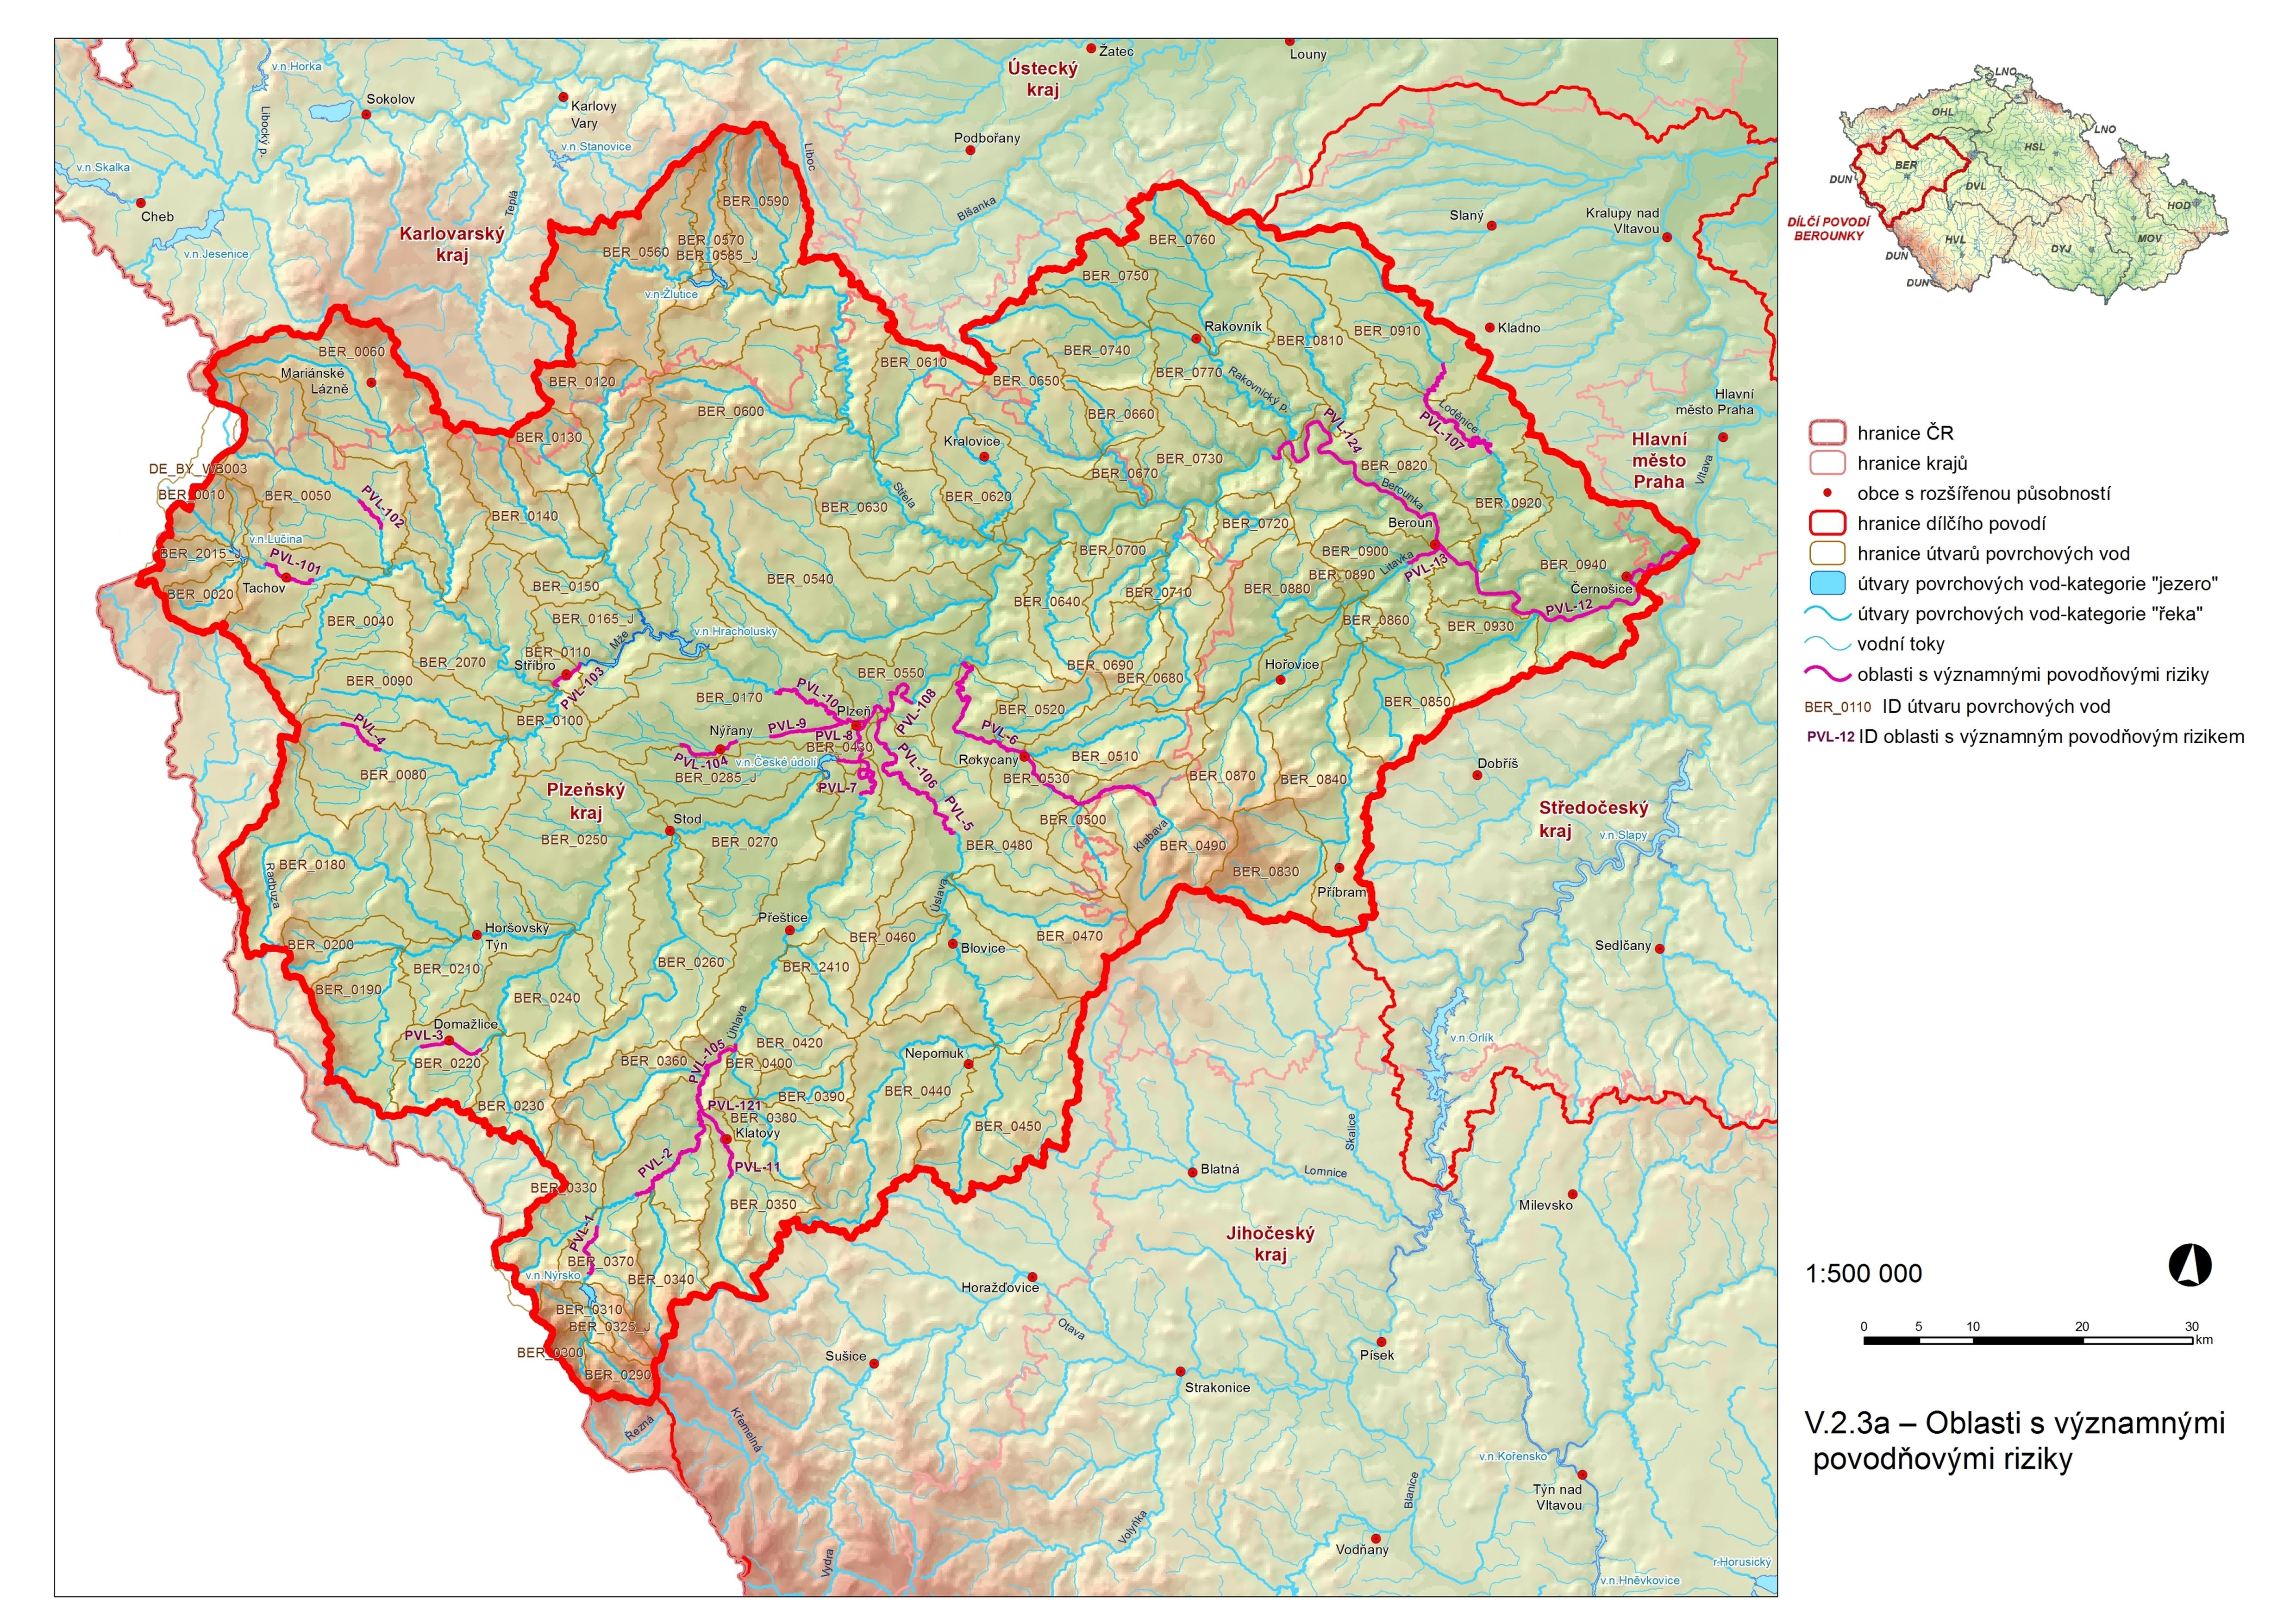 Plan Dilciho Povodi Berounky V Ochrana Pred Povodnemi A Vodni